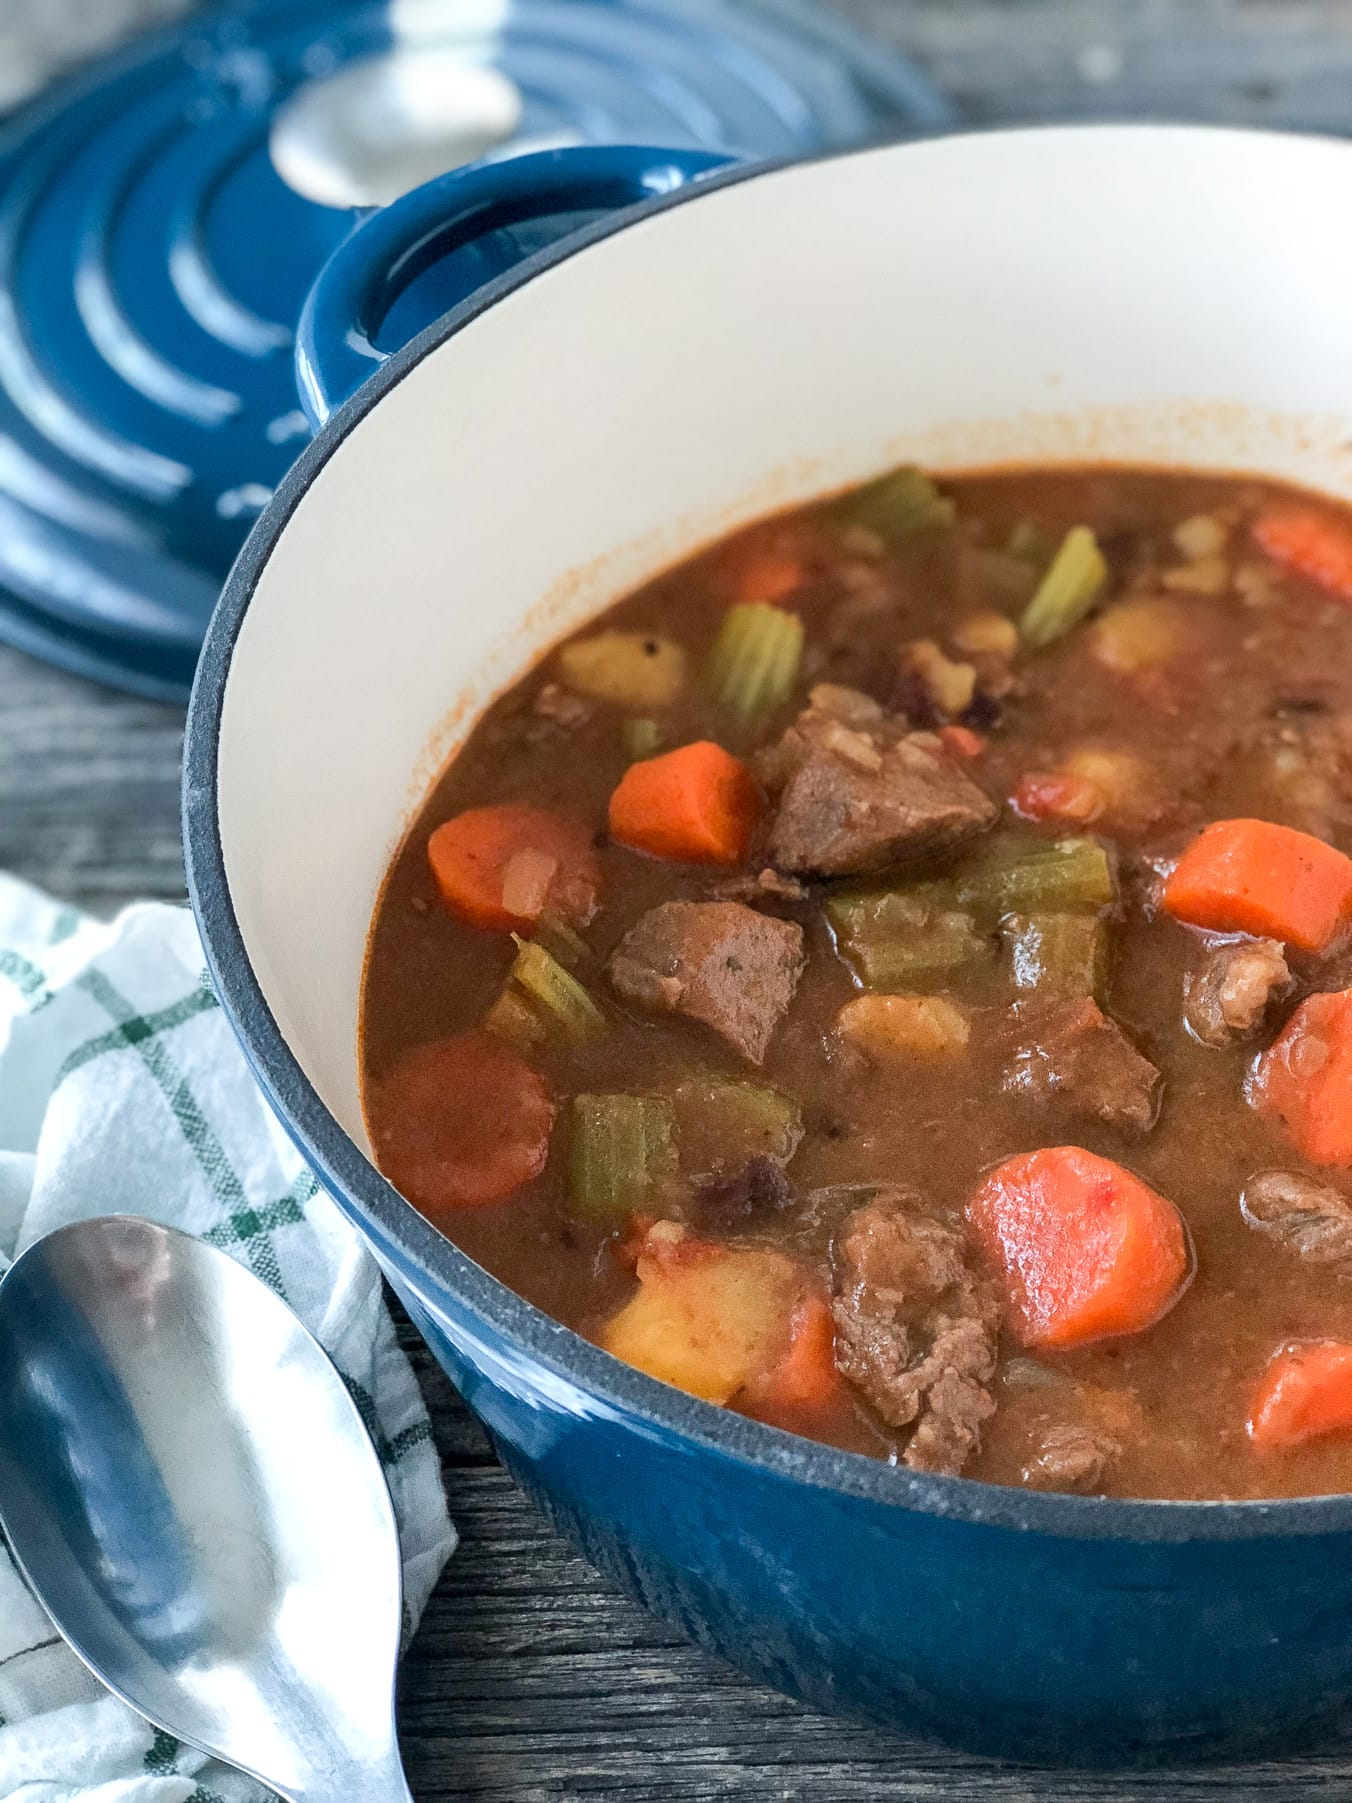 45 Minute Instant Pot Beef Stew